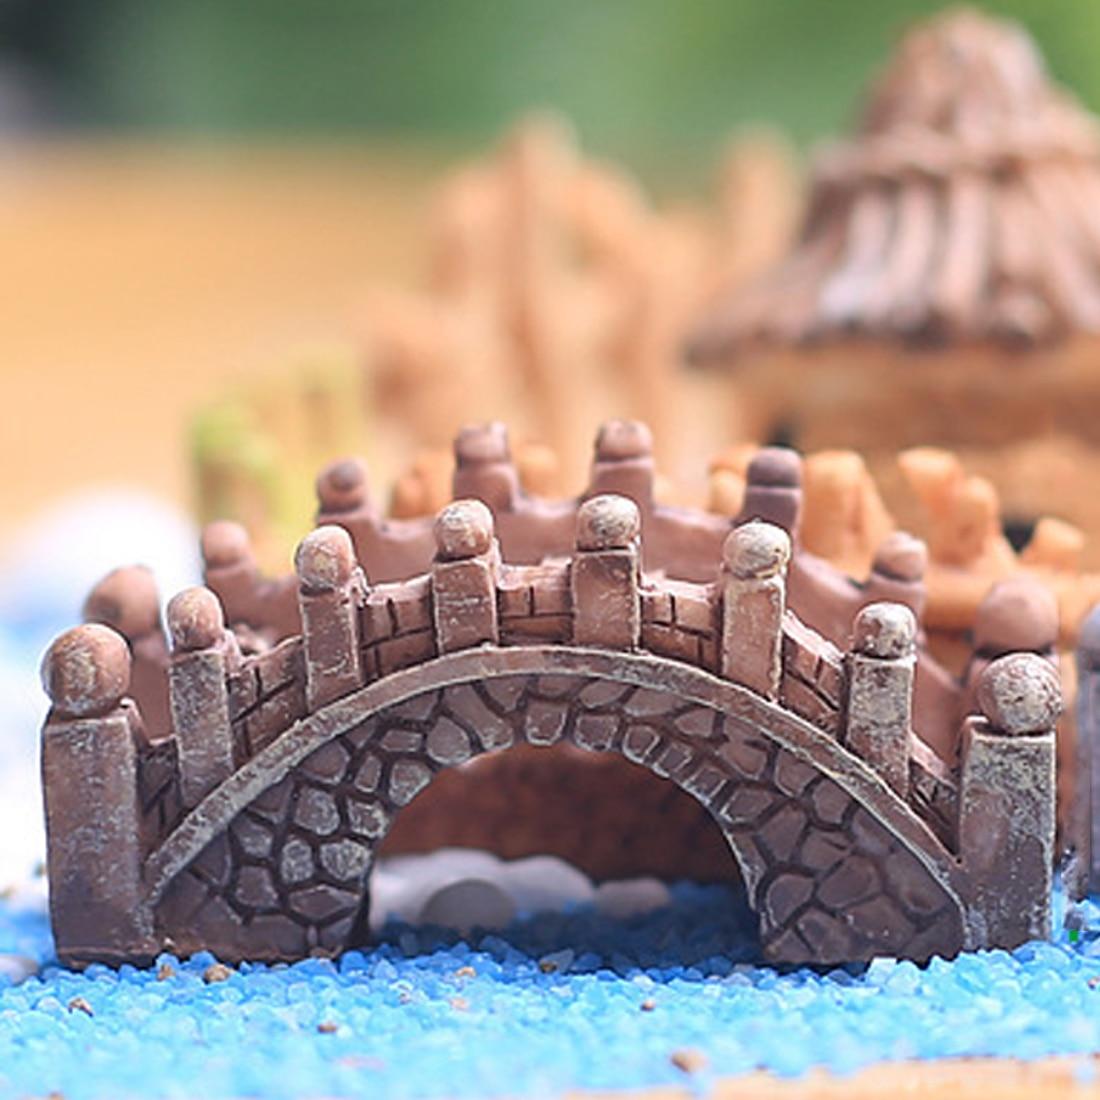 Top Sale Stone Bridge Figurines Mini Resin Crafts Fairy Garden Miniatures DIY Terrarium Succulents Landscape Decoration